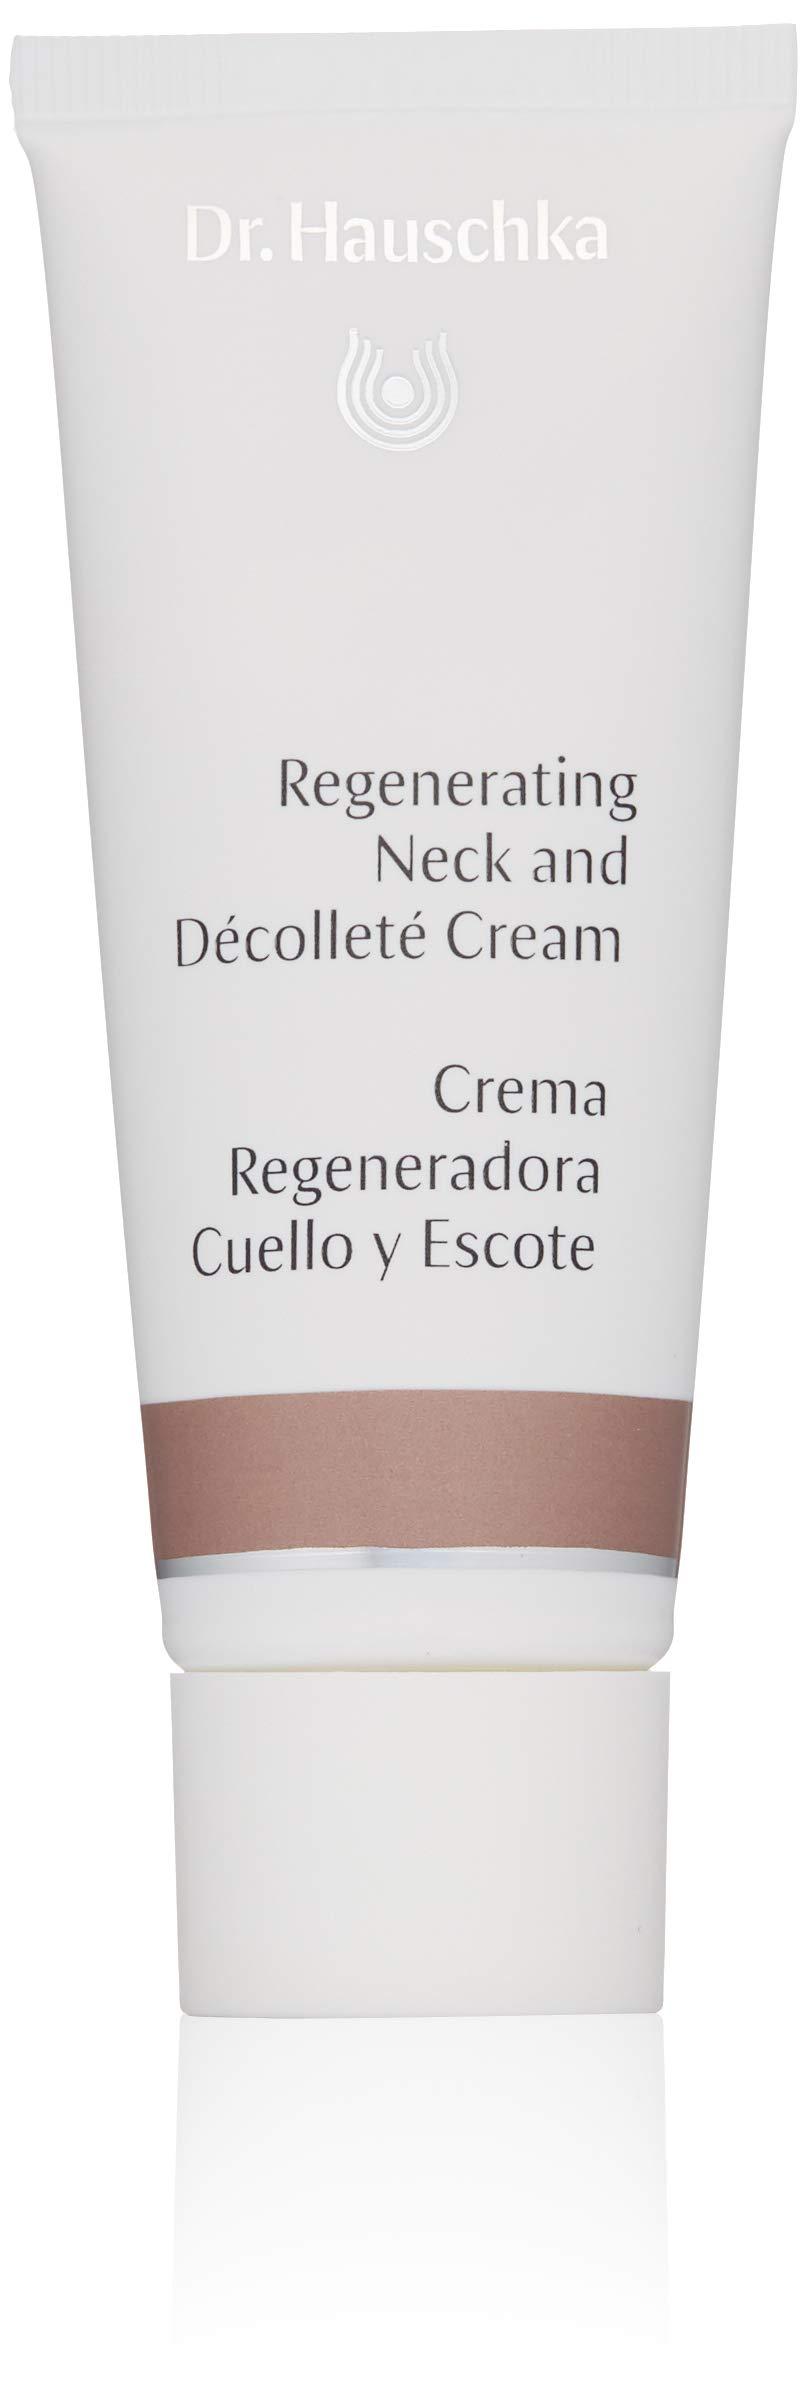 Dr. Hauschka Regenerating Neck and Decollete Cream, 1.3 Fl Oz